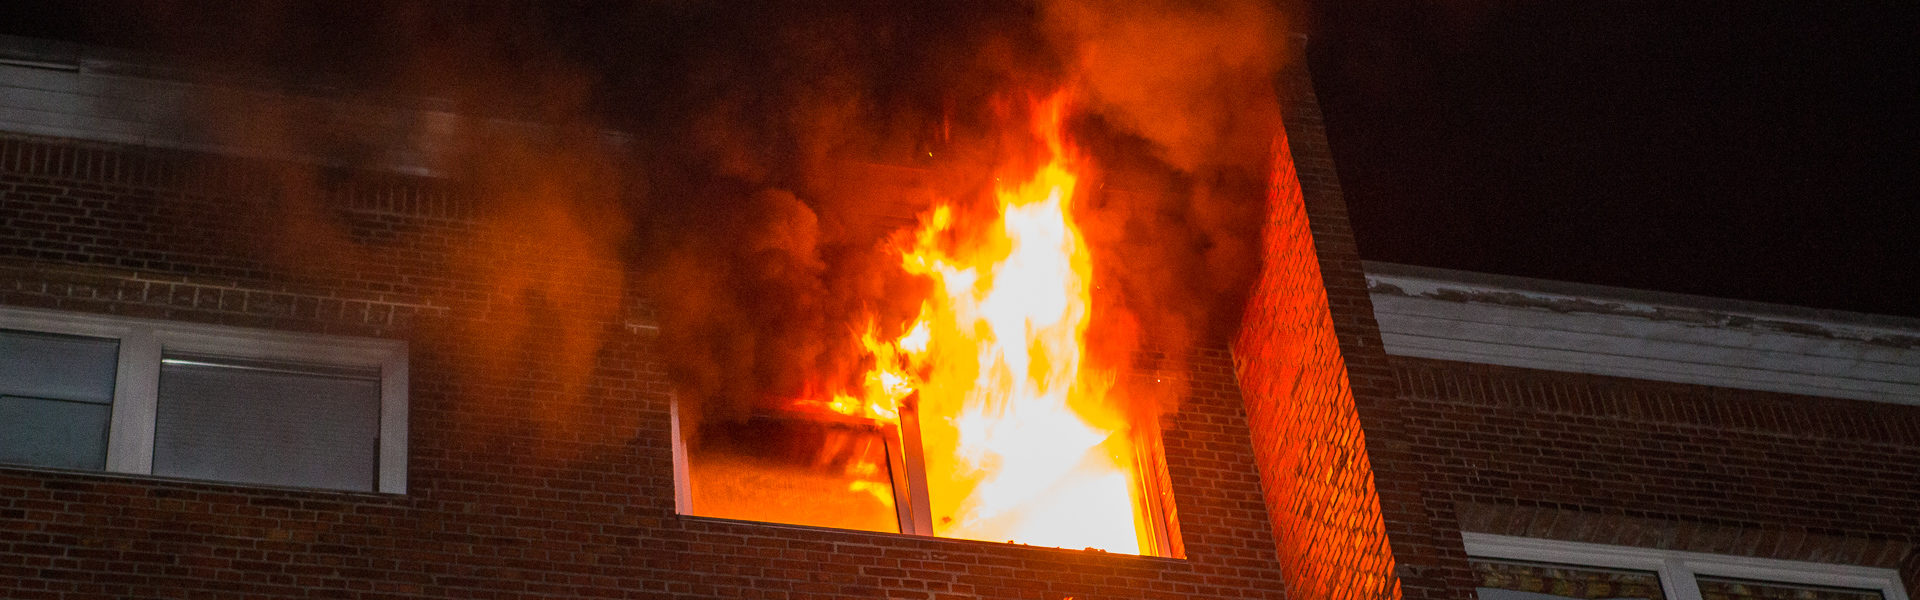 17.05.2020 – Mann entkommt Flammenhölle in HH-Barmbek